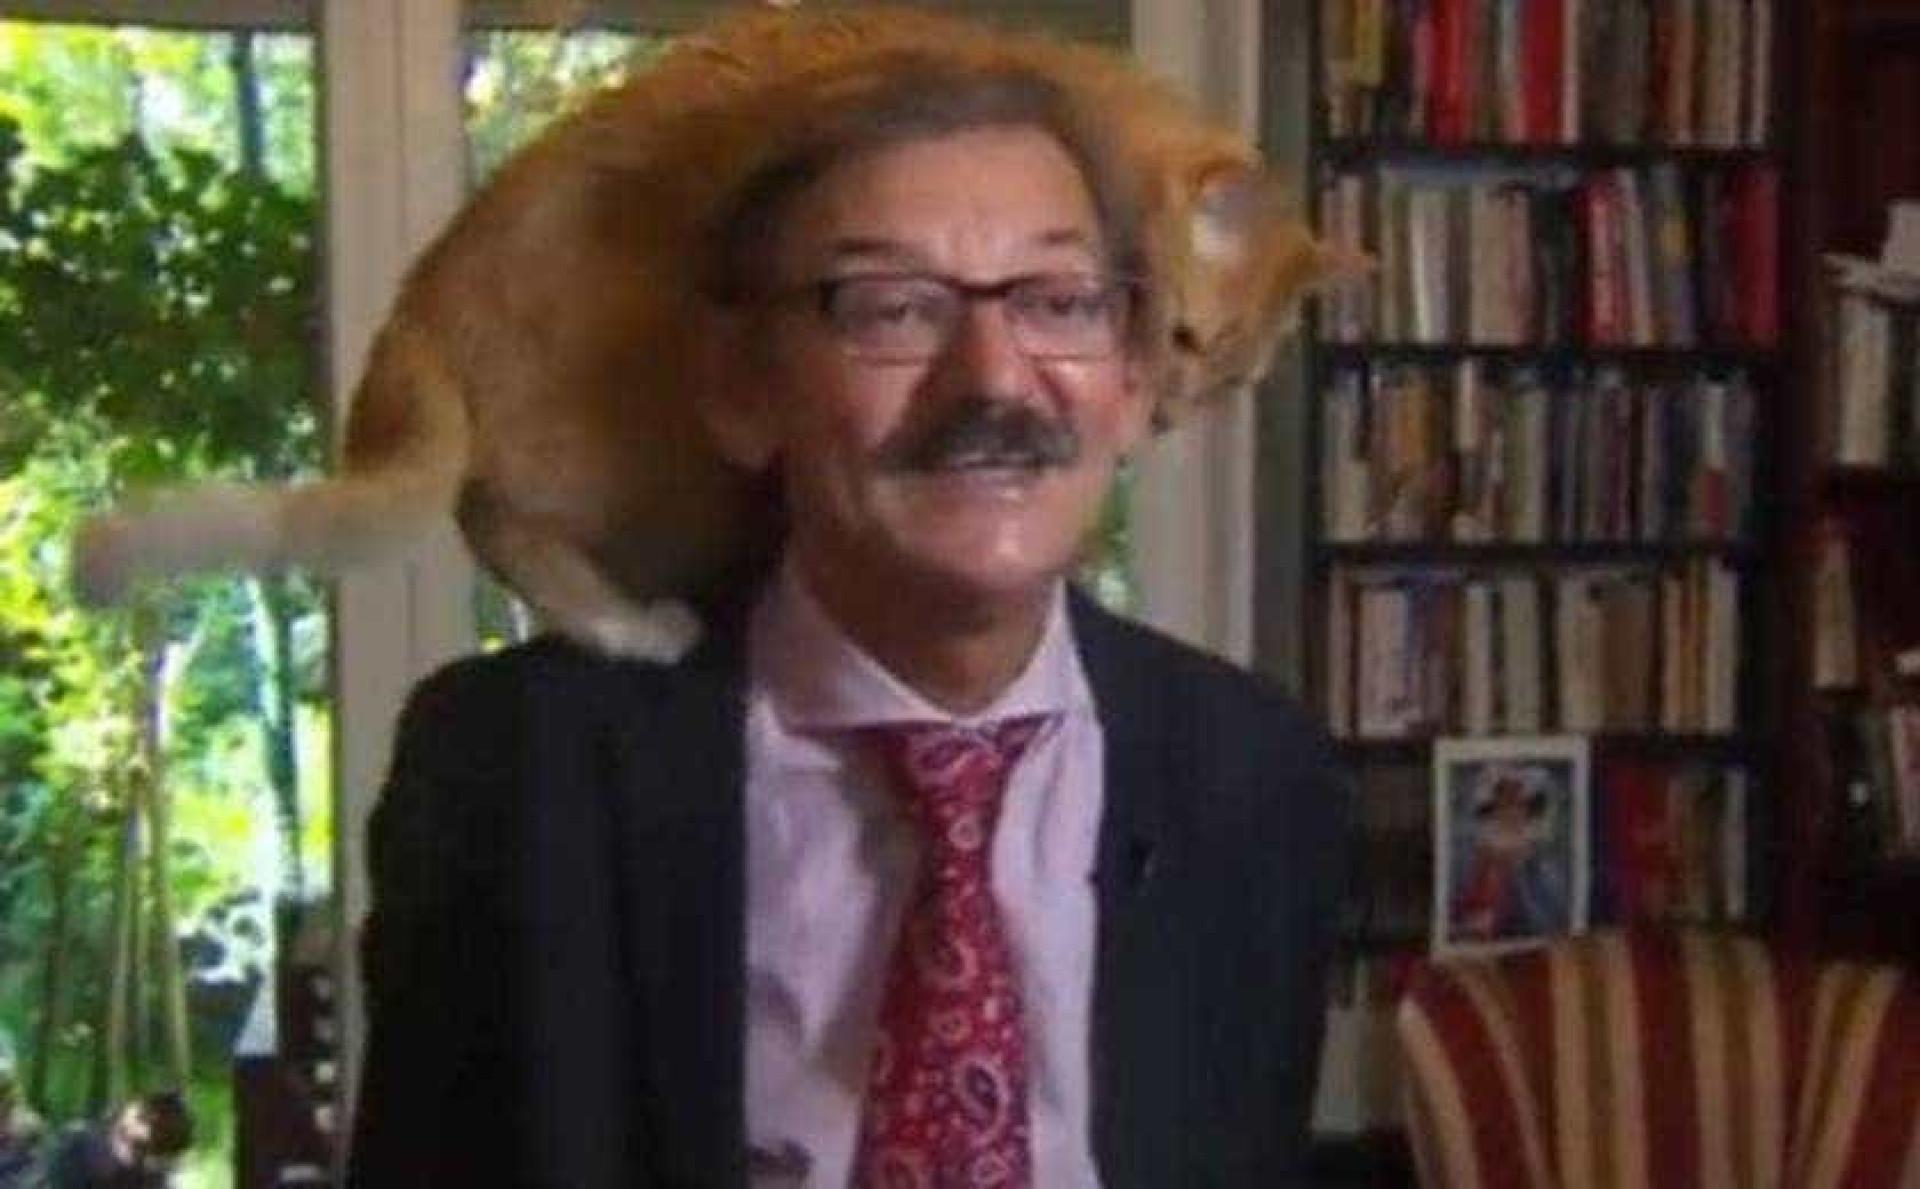 Gato interrompe professor durante entrevista ao vivo; vídeo